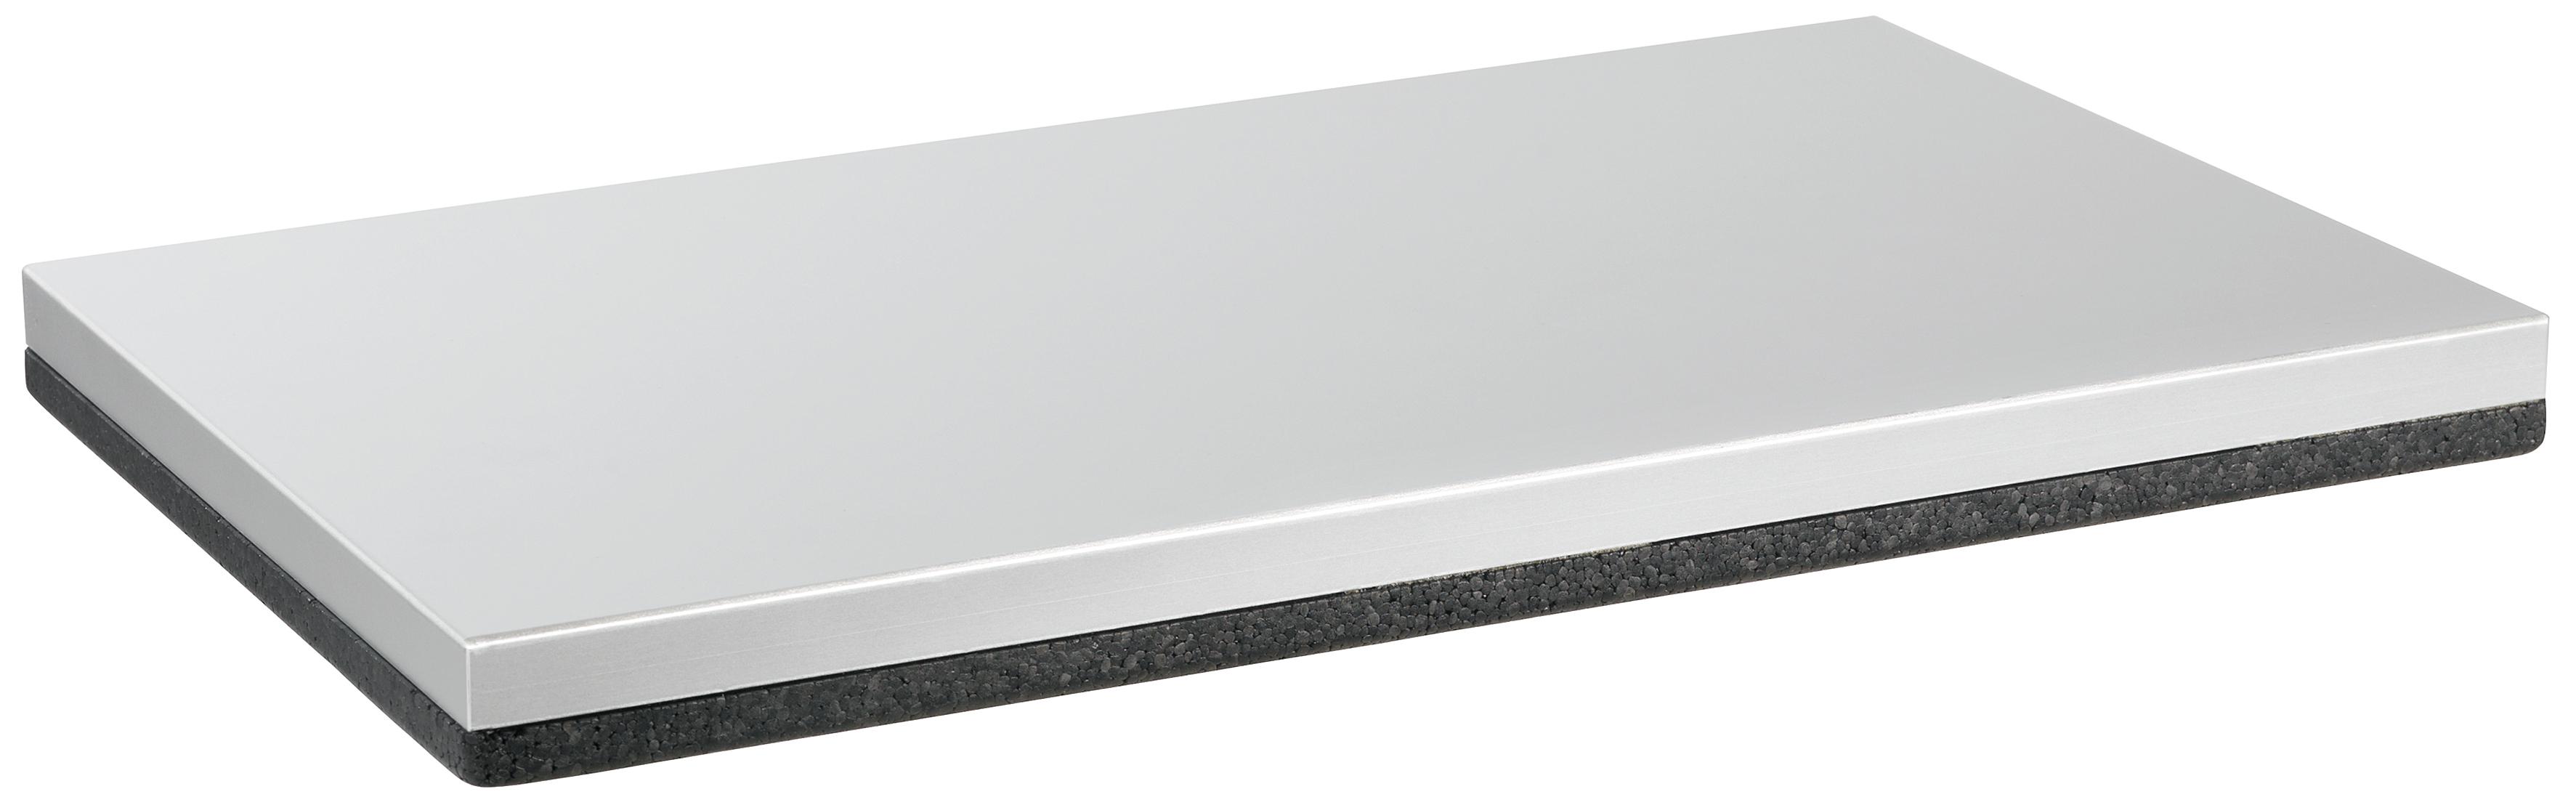 Icetainer Kylbricka 52cm x 32cm